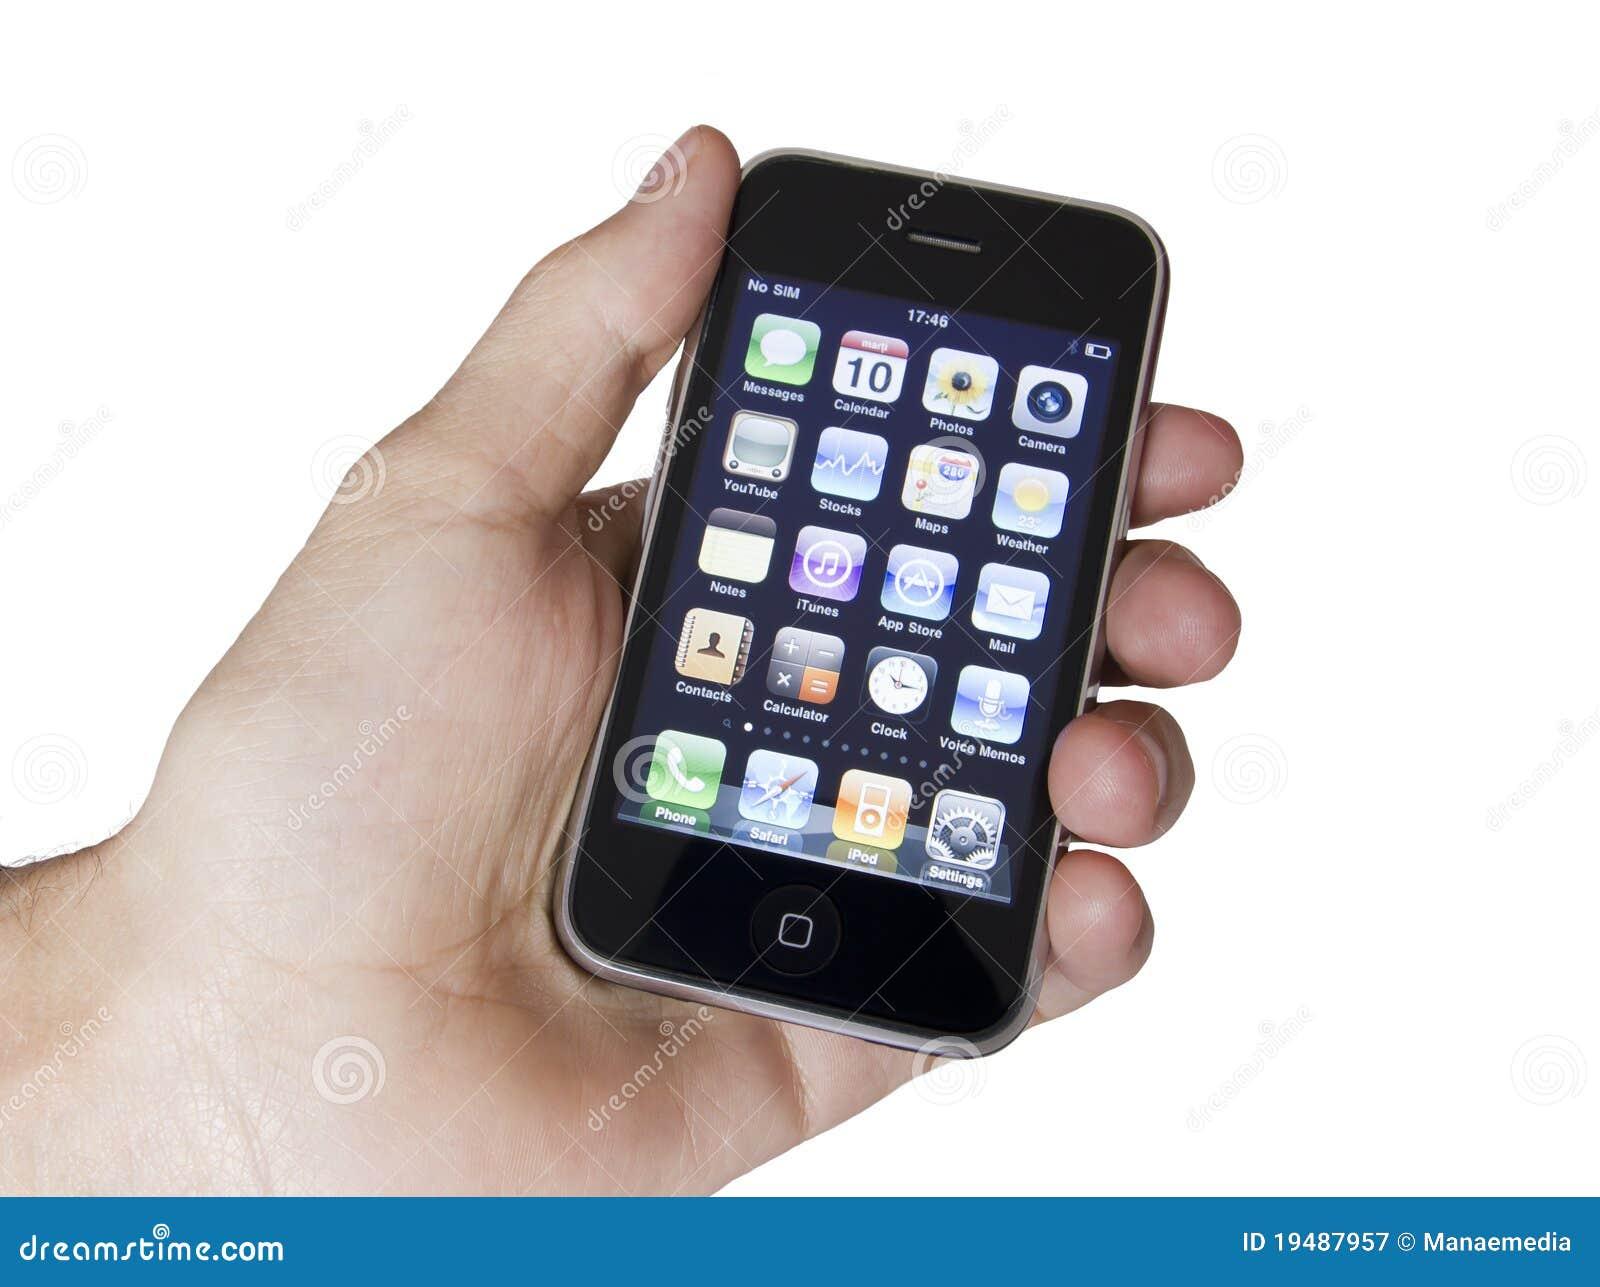 Apple IPhone 3GS Edito...